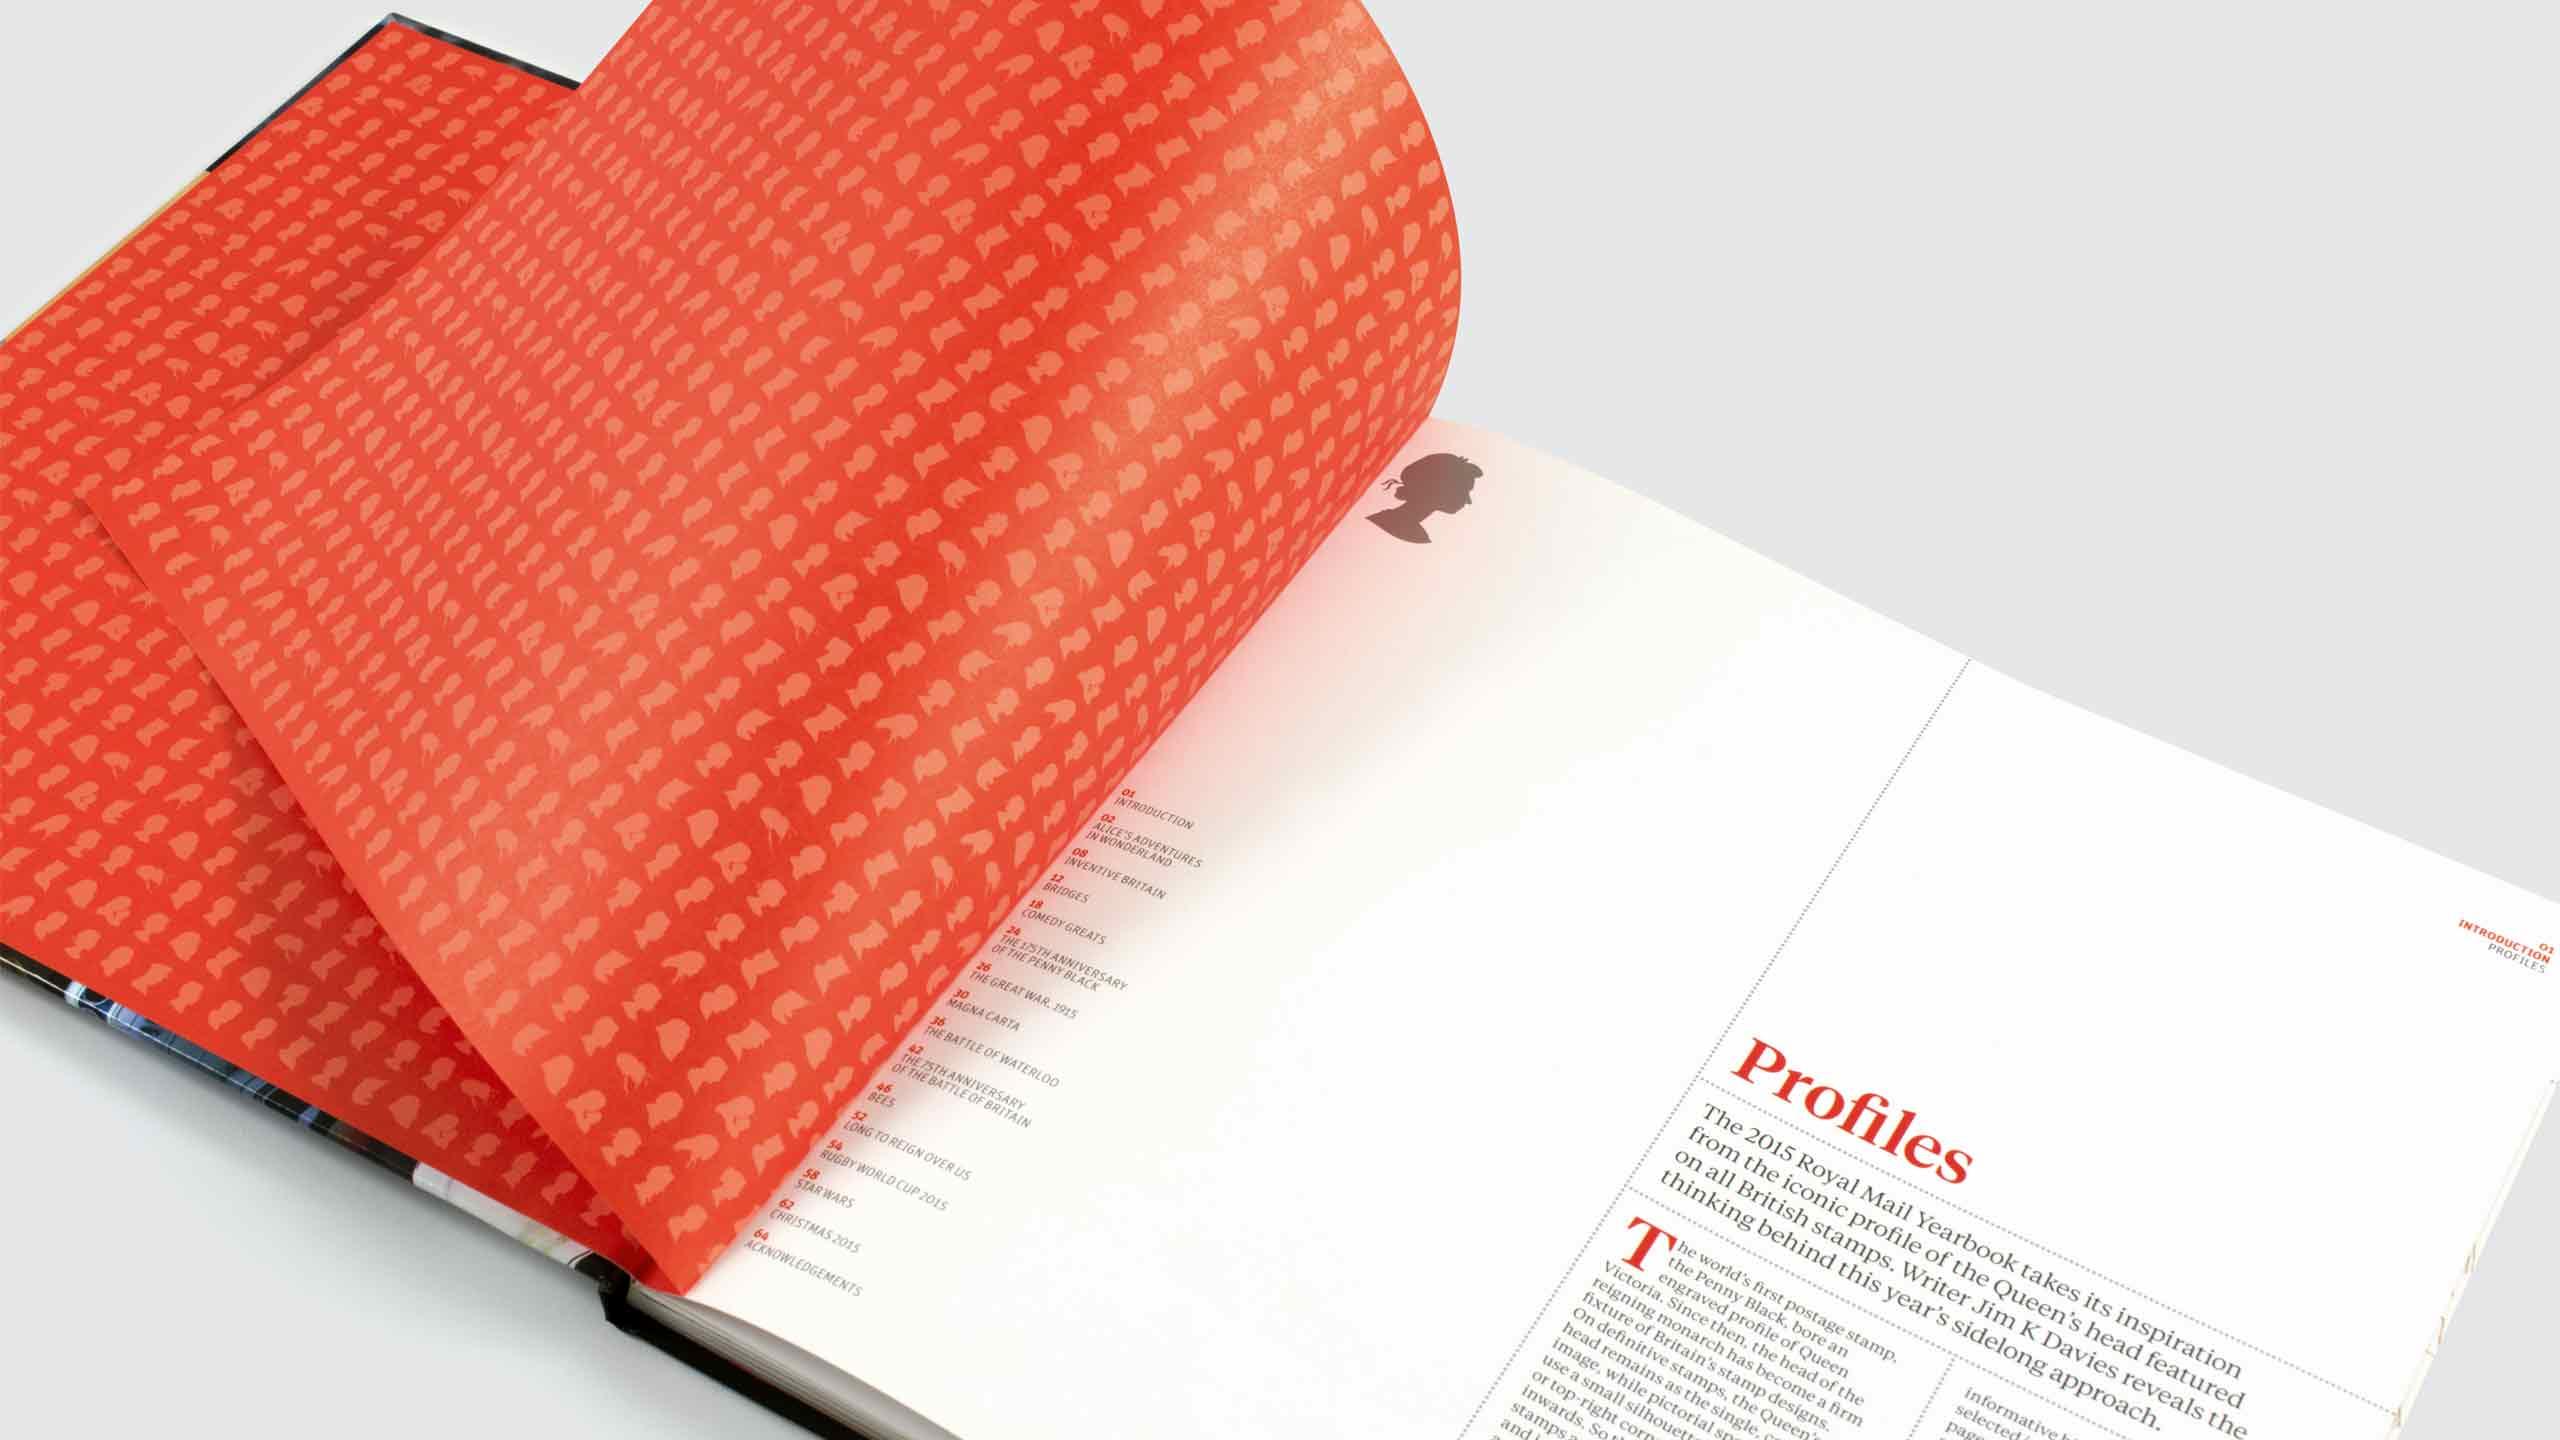 RM_Year_Book_Carousel-1